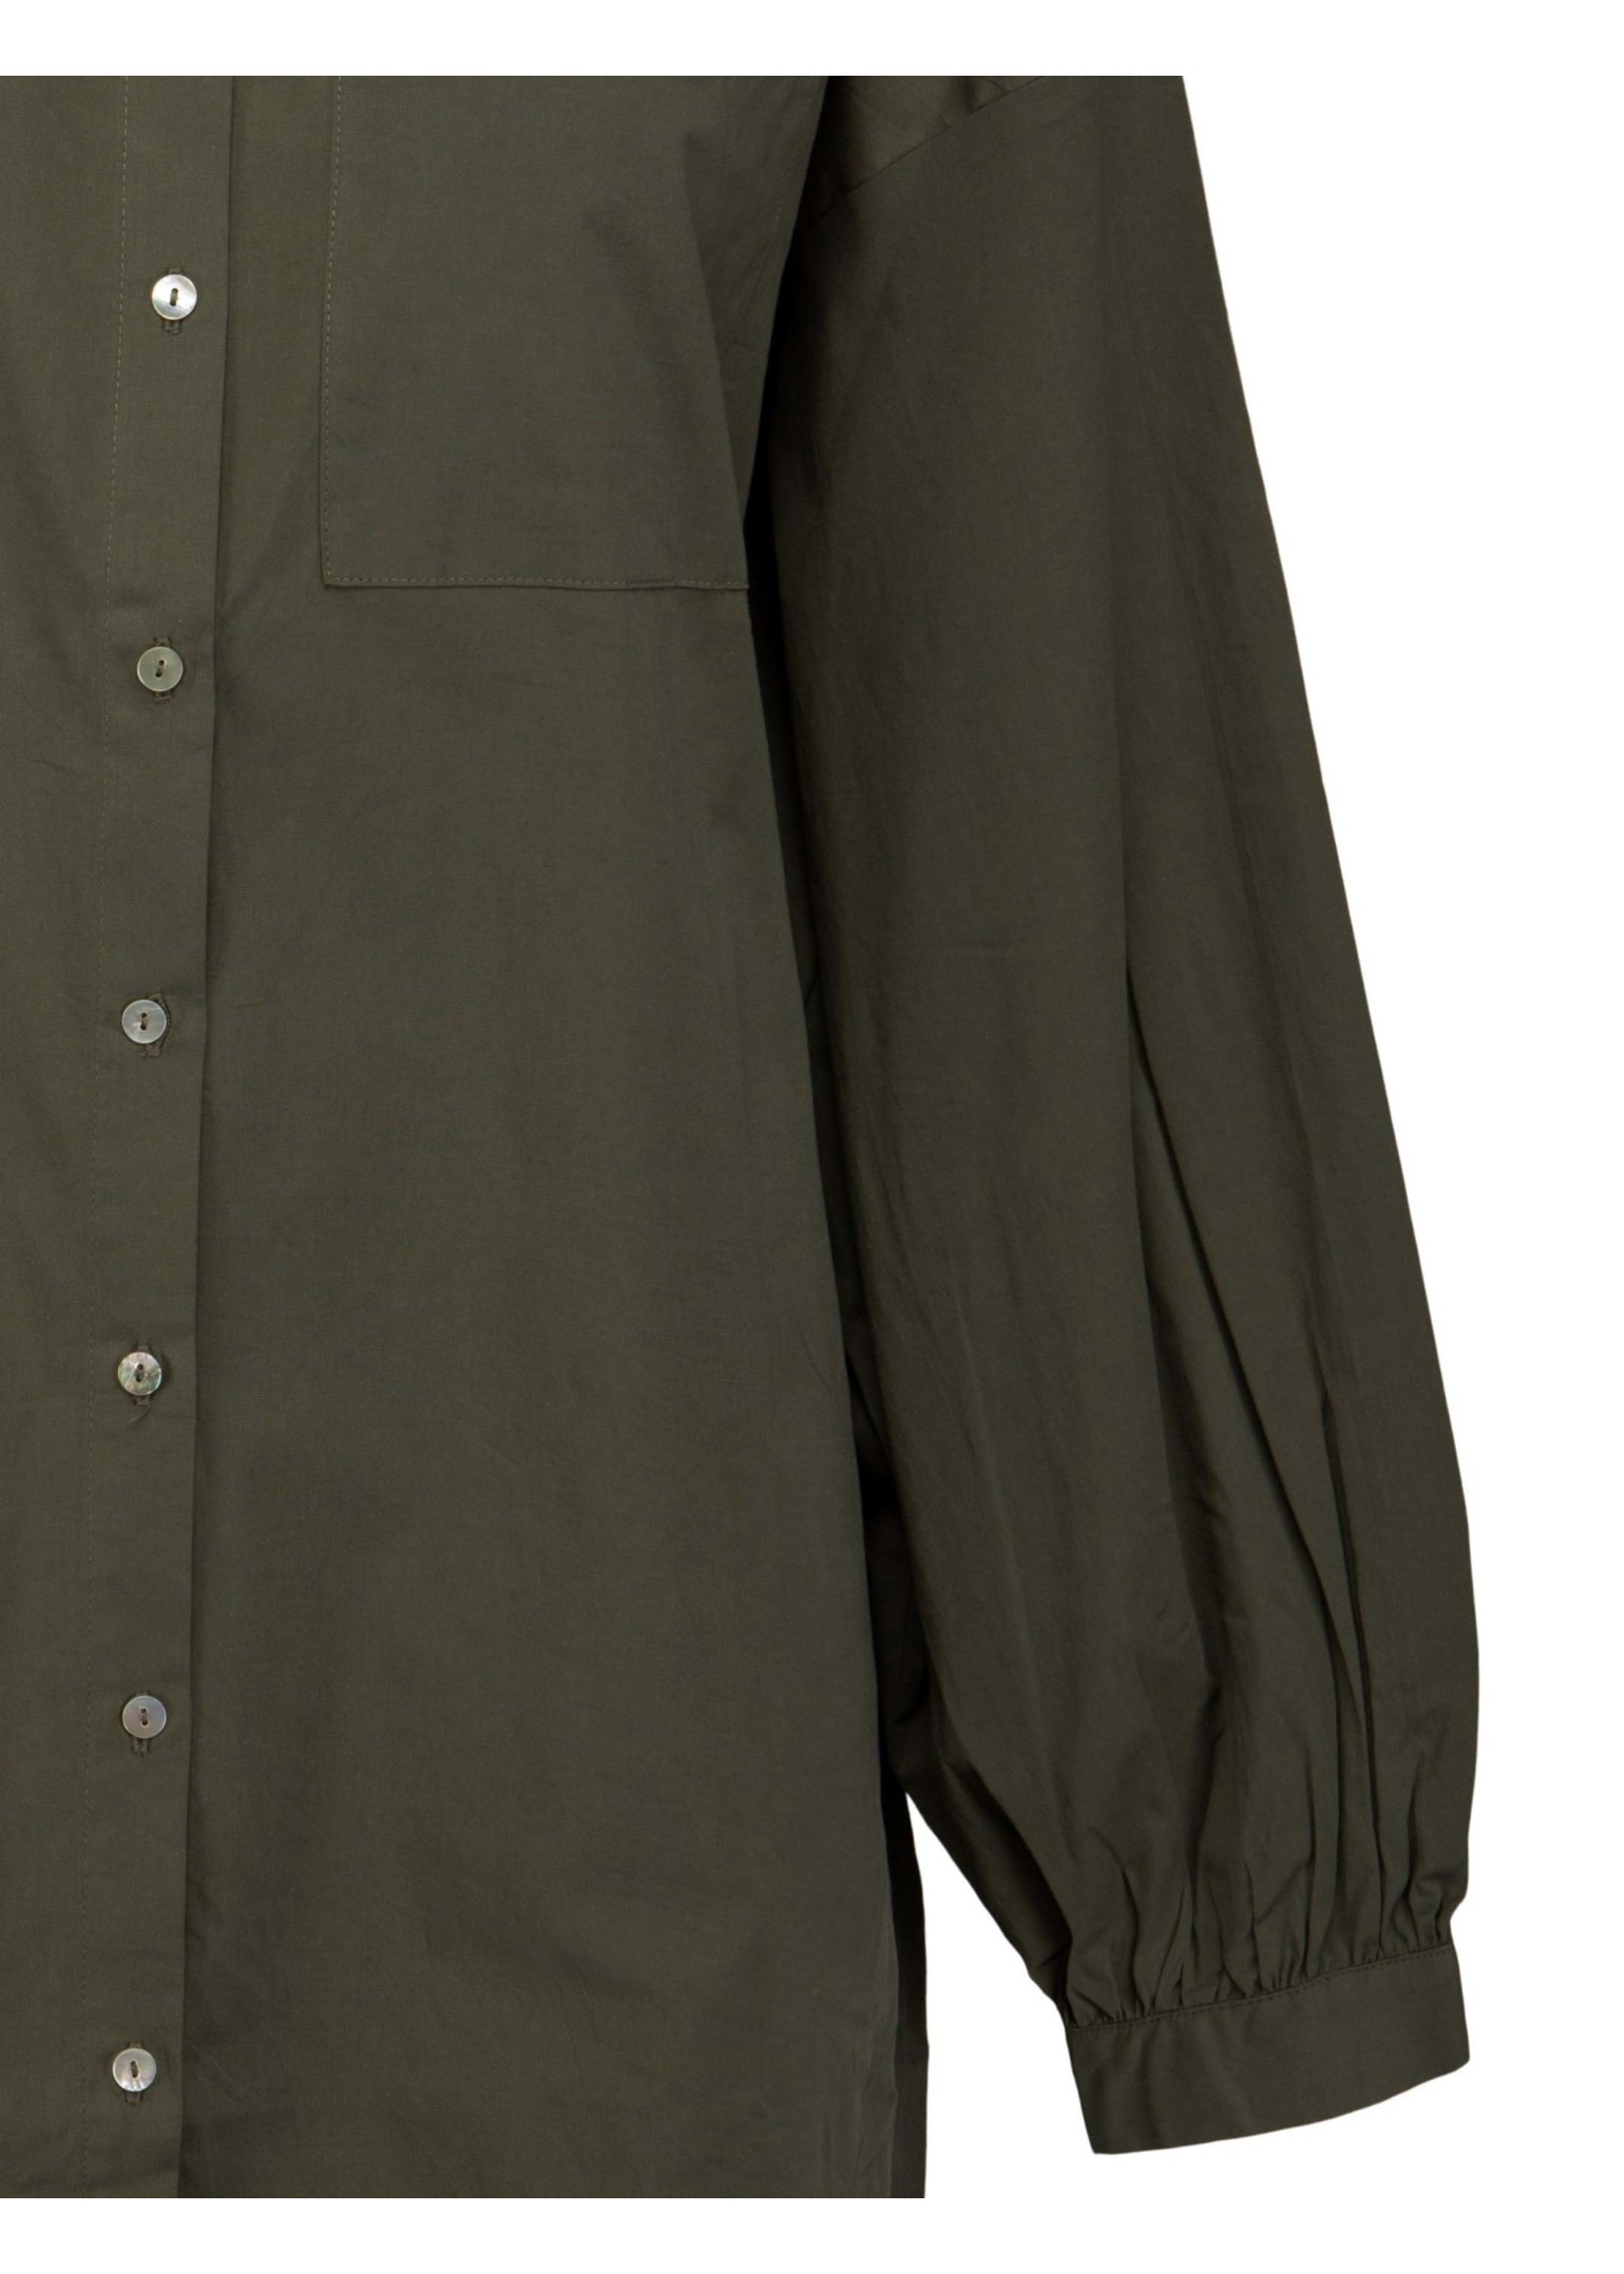 MINUS Iluna shirt dress army green